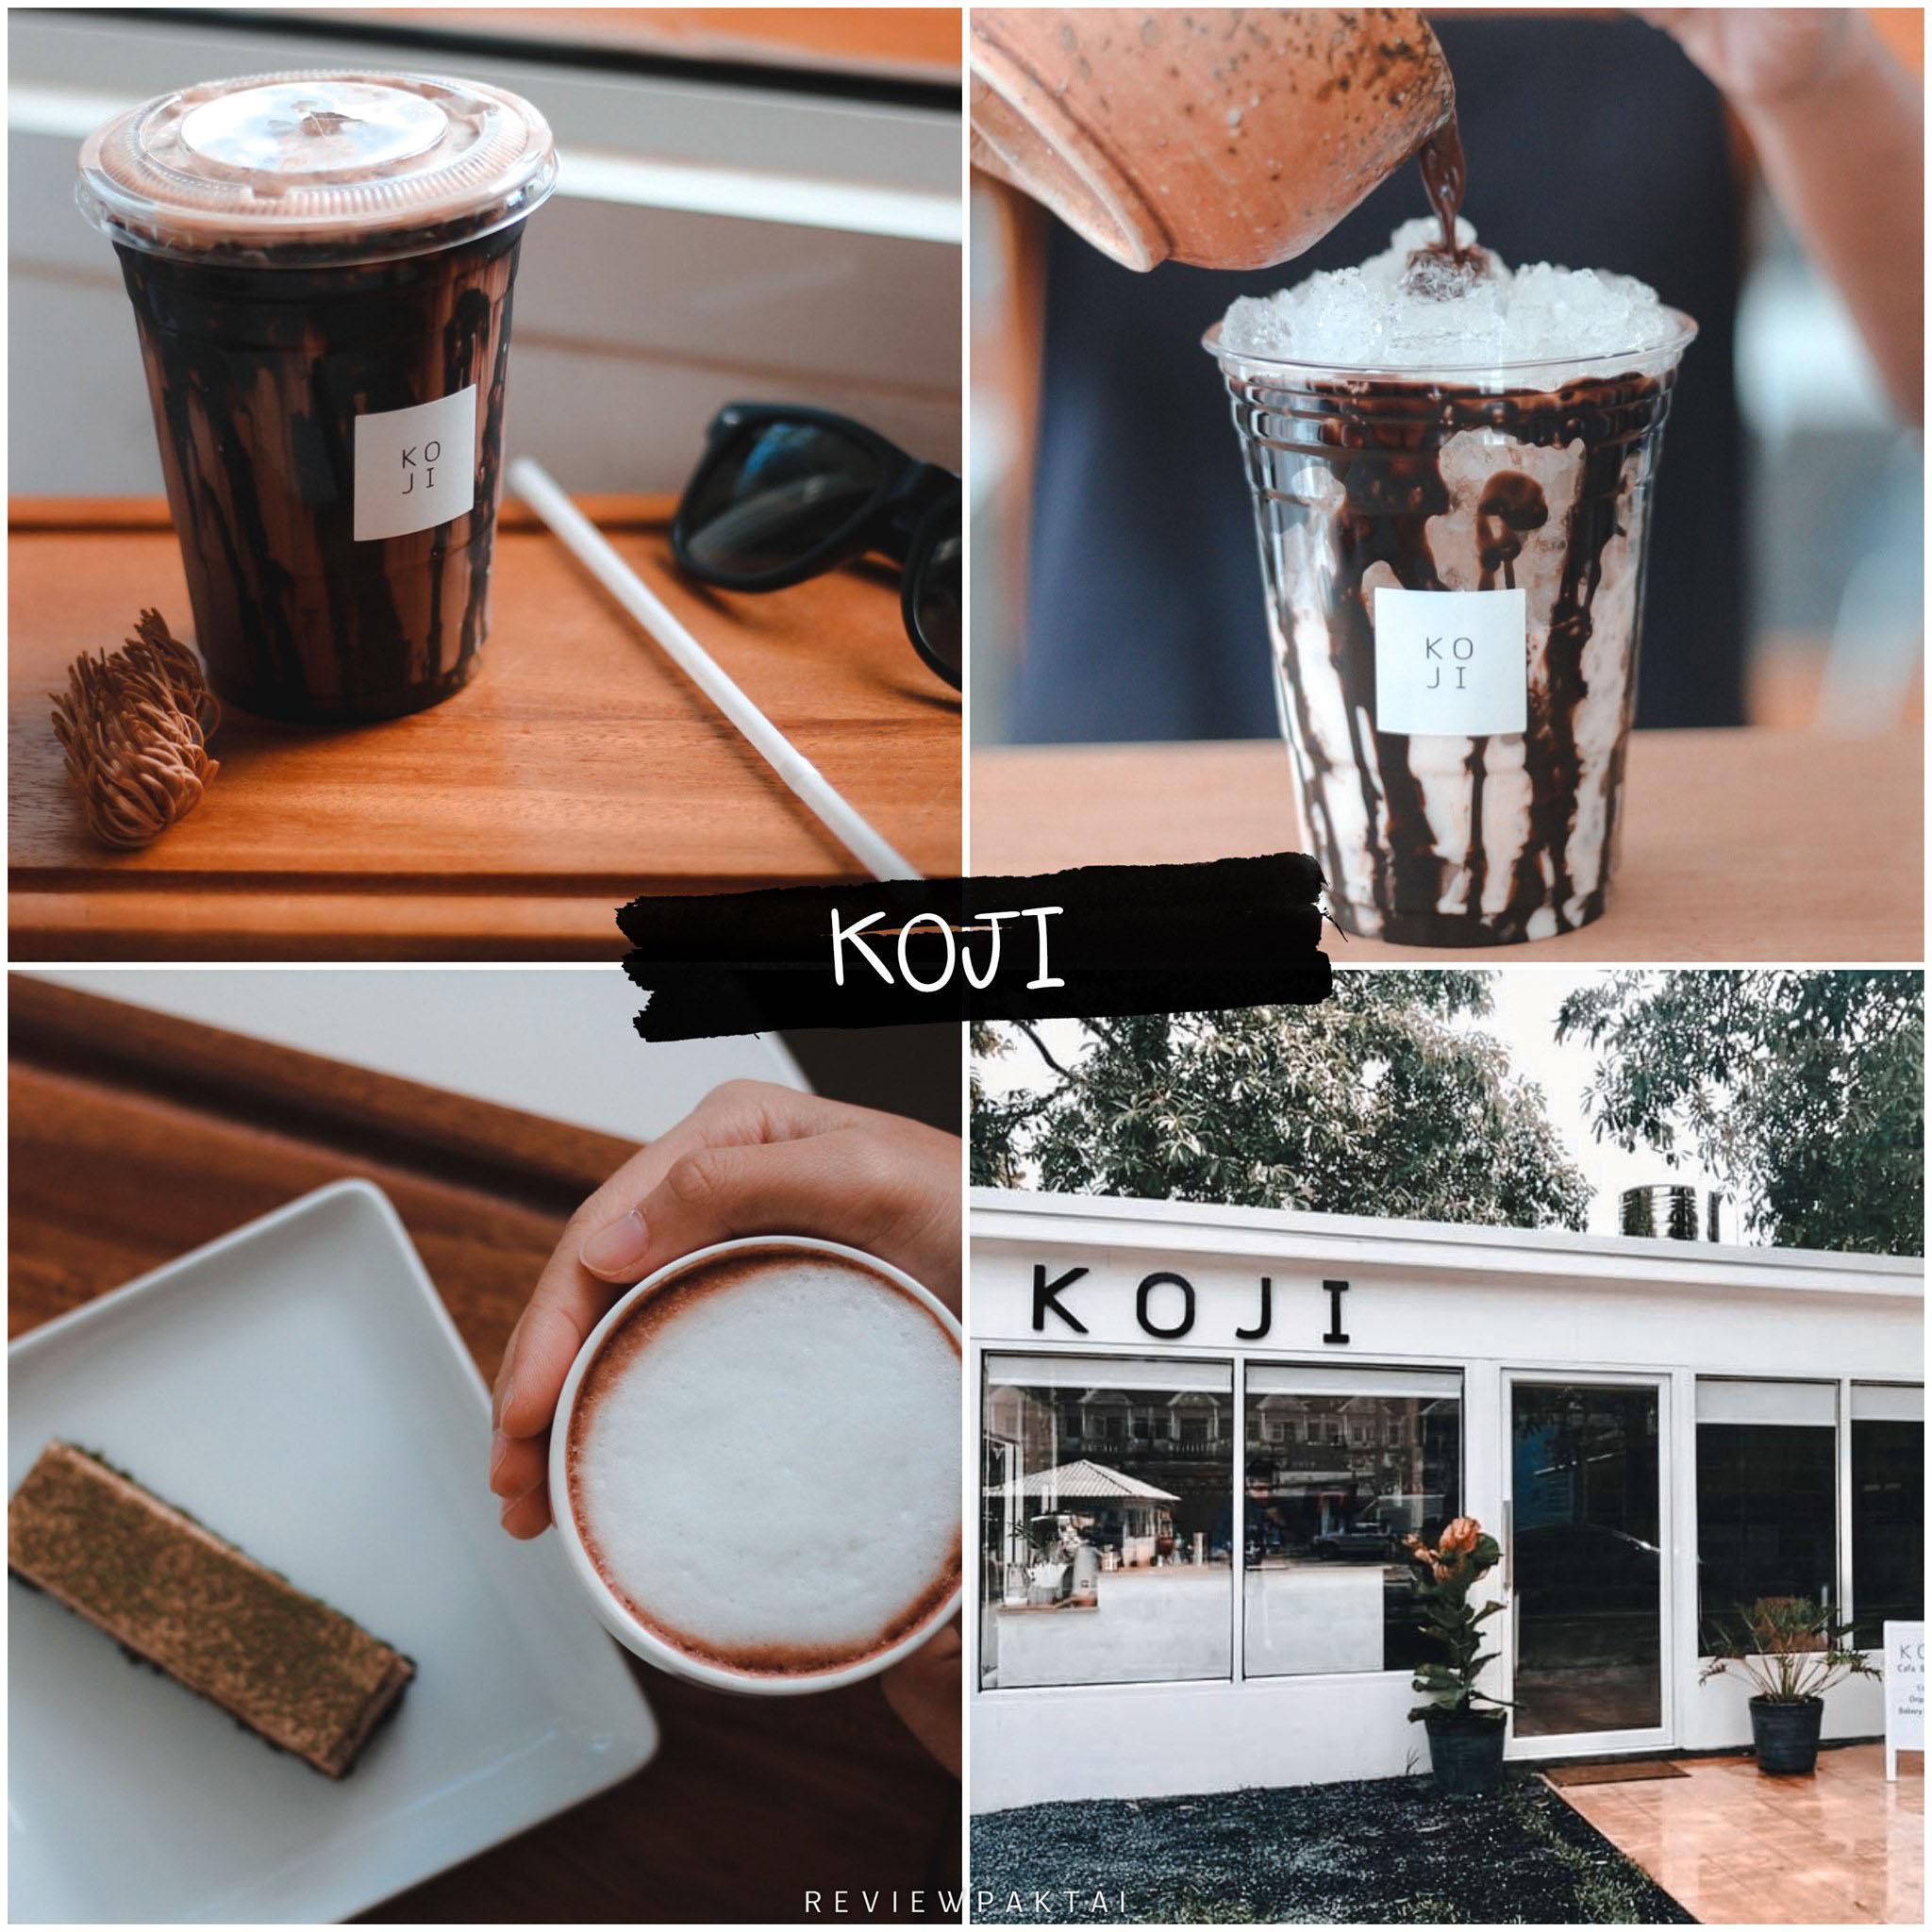 Koji-cafe-dessert ร้านเล็กๆบรรยากาศดีๆ-แต่งร้านด้วยโทนสีขาวสบายตาตัวร้านมีความเป็นส่วนตัว-เหมาะกับการไปนั้งทำงานด้วยอาหารที่แนะนำก็ชีสเค้กแบบต่างๆ-เช่นชีสเค้กสตอเบอรี่หวานๆหอมๆ-แนะนำๆแล้วแต่ชอบกันเลยราคาไม่แพงชาก็หวานกำลังพอดี-ไม่หวานมากไป-แต่ถ้าใครไม่ชอบหวานมากหรือรสชาติกลางๆบอกคนทำว่าหวานน้อยจะได้พอดีกลางๆ ภูเก็ต,คาเฟ่,ที่เที่ยว,ร้านกาแฟ,เด็ด,อร่อย,ต้องลอง